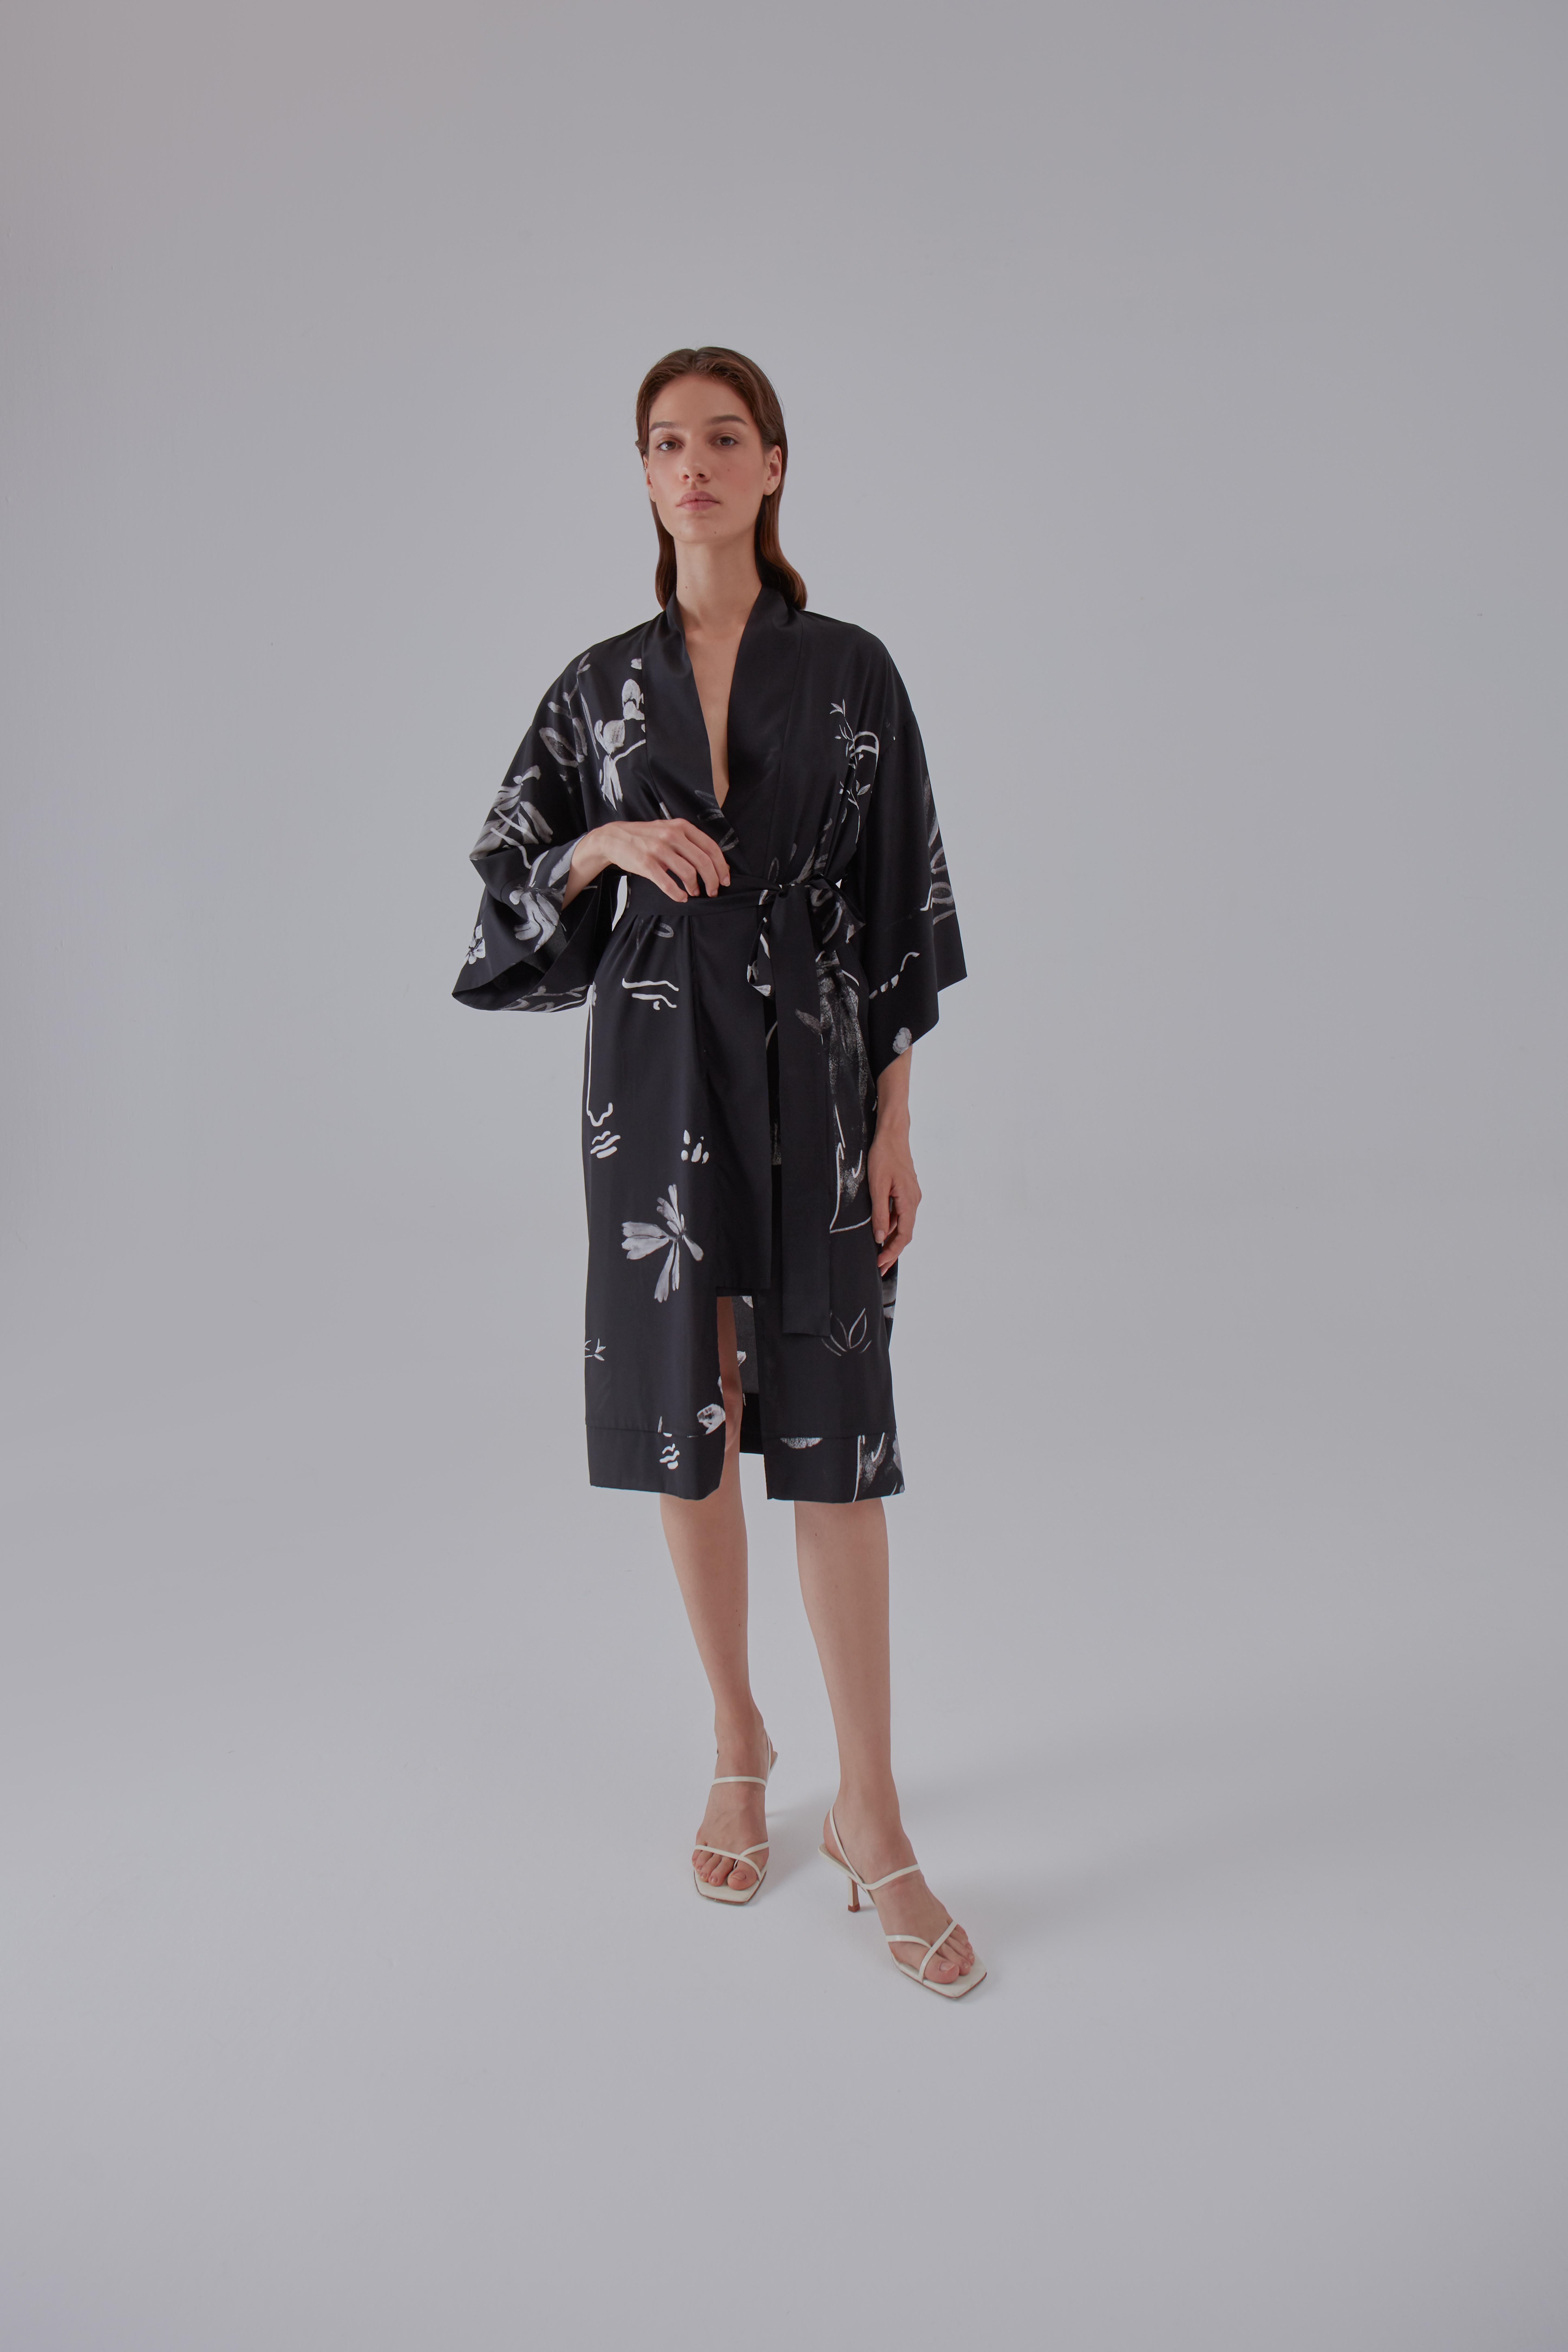 Yoko Kimono - Black by Laika on curated-crowd.com